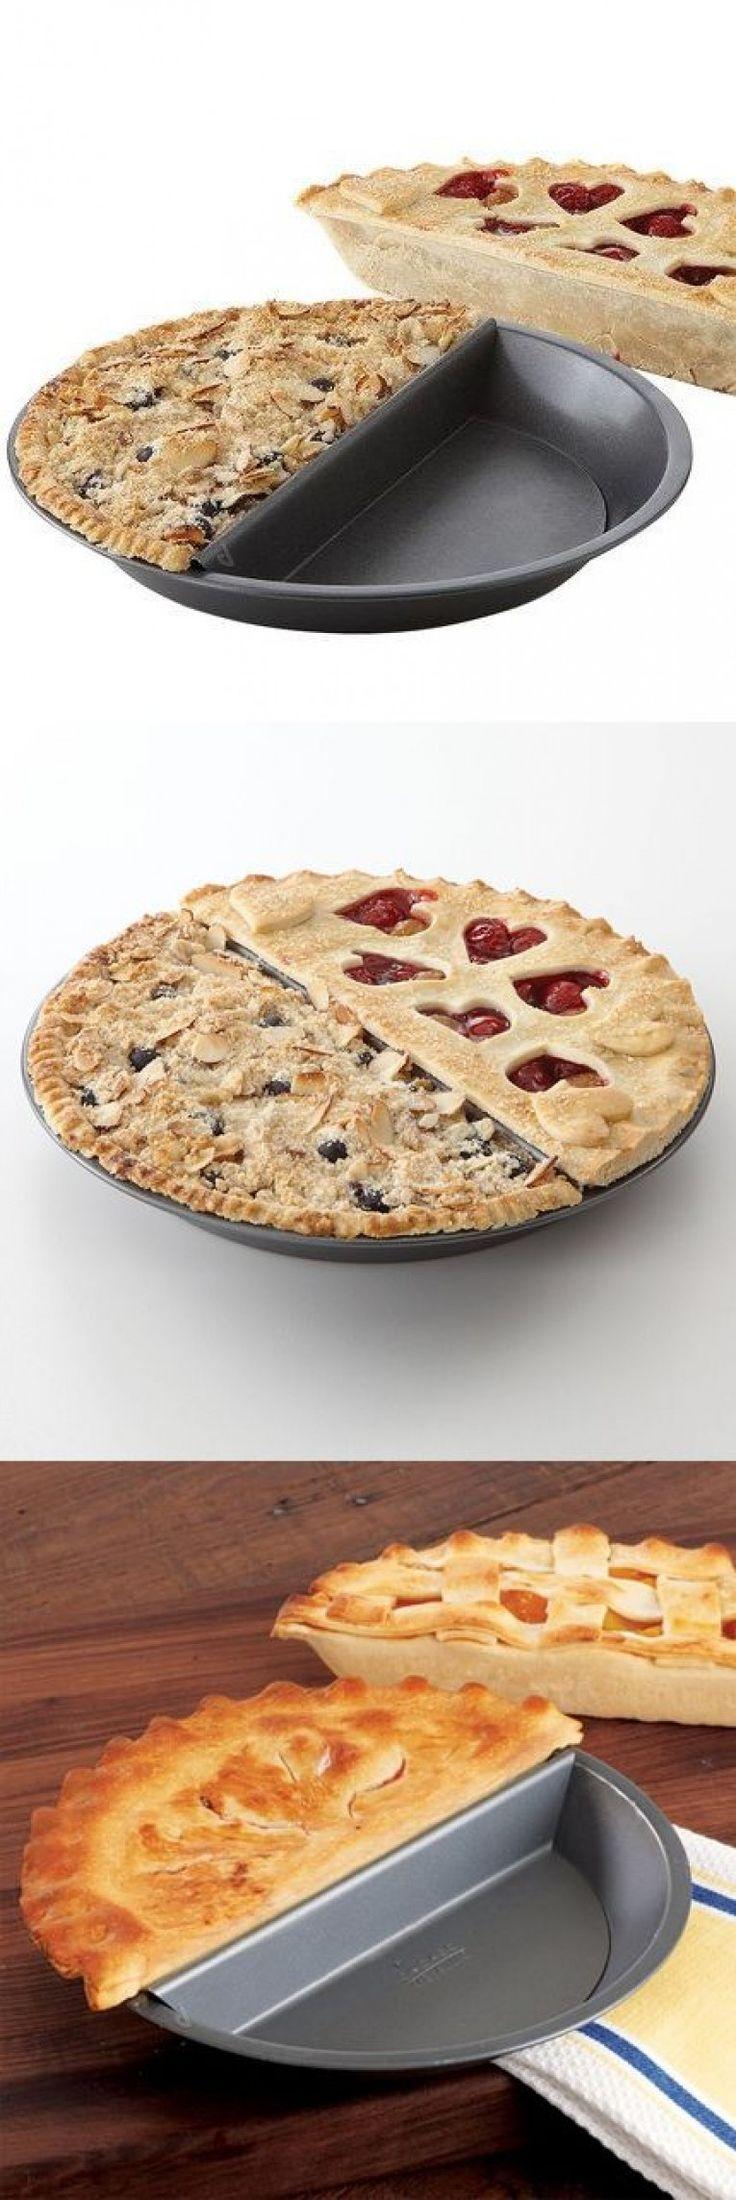 Non-Stick 9-Inch Split Decision Pie Pan